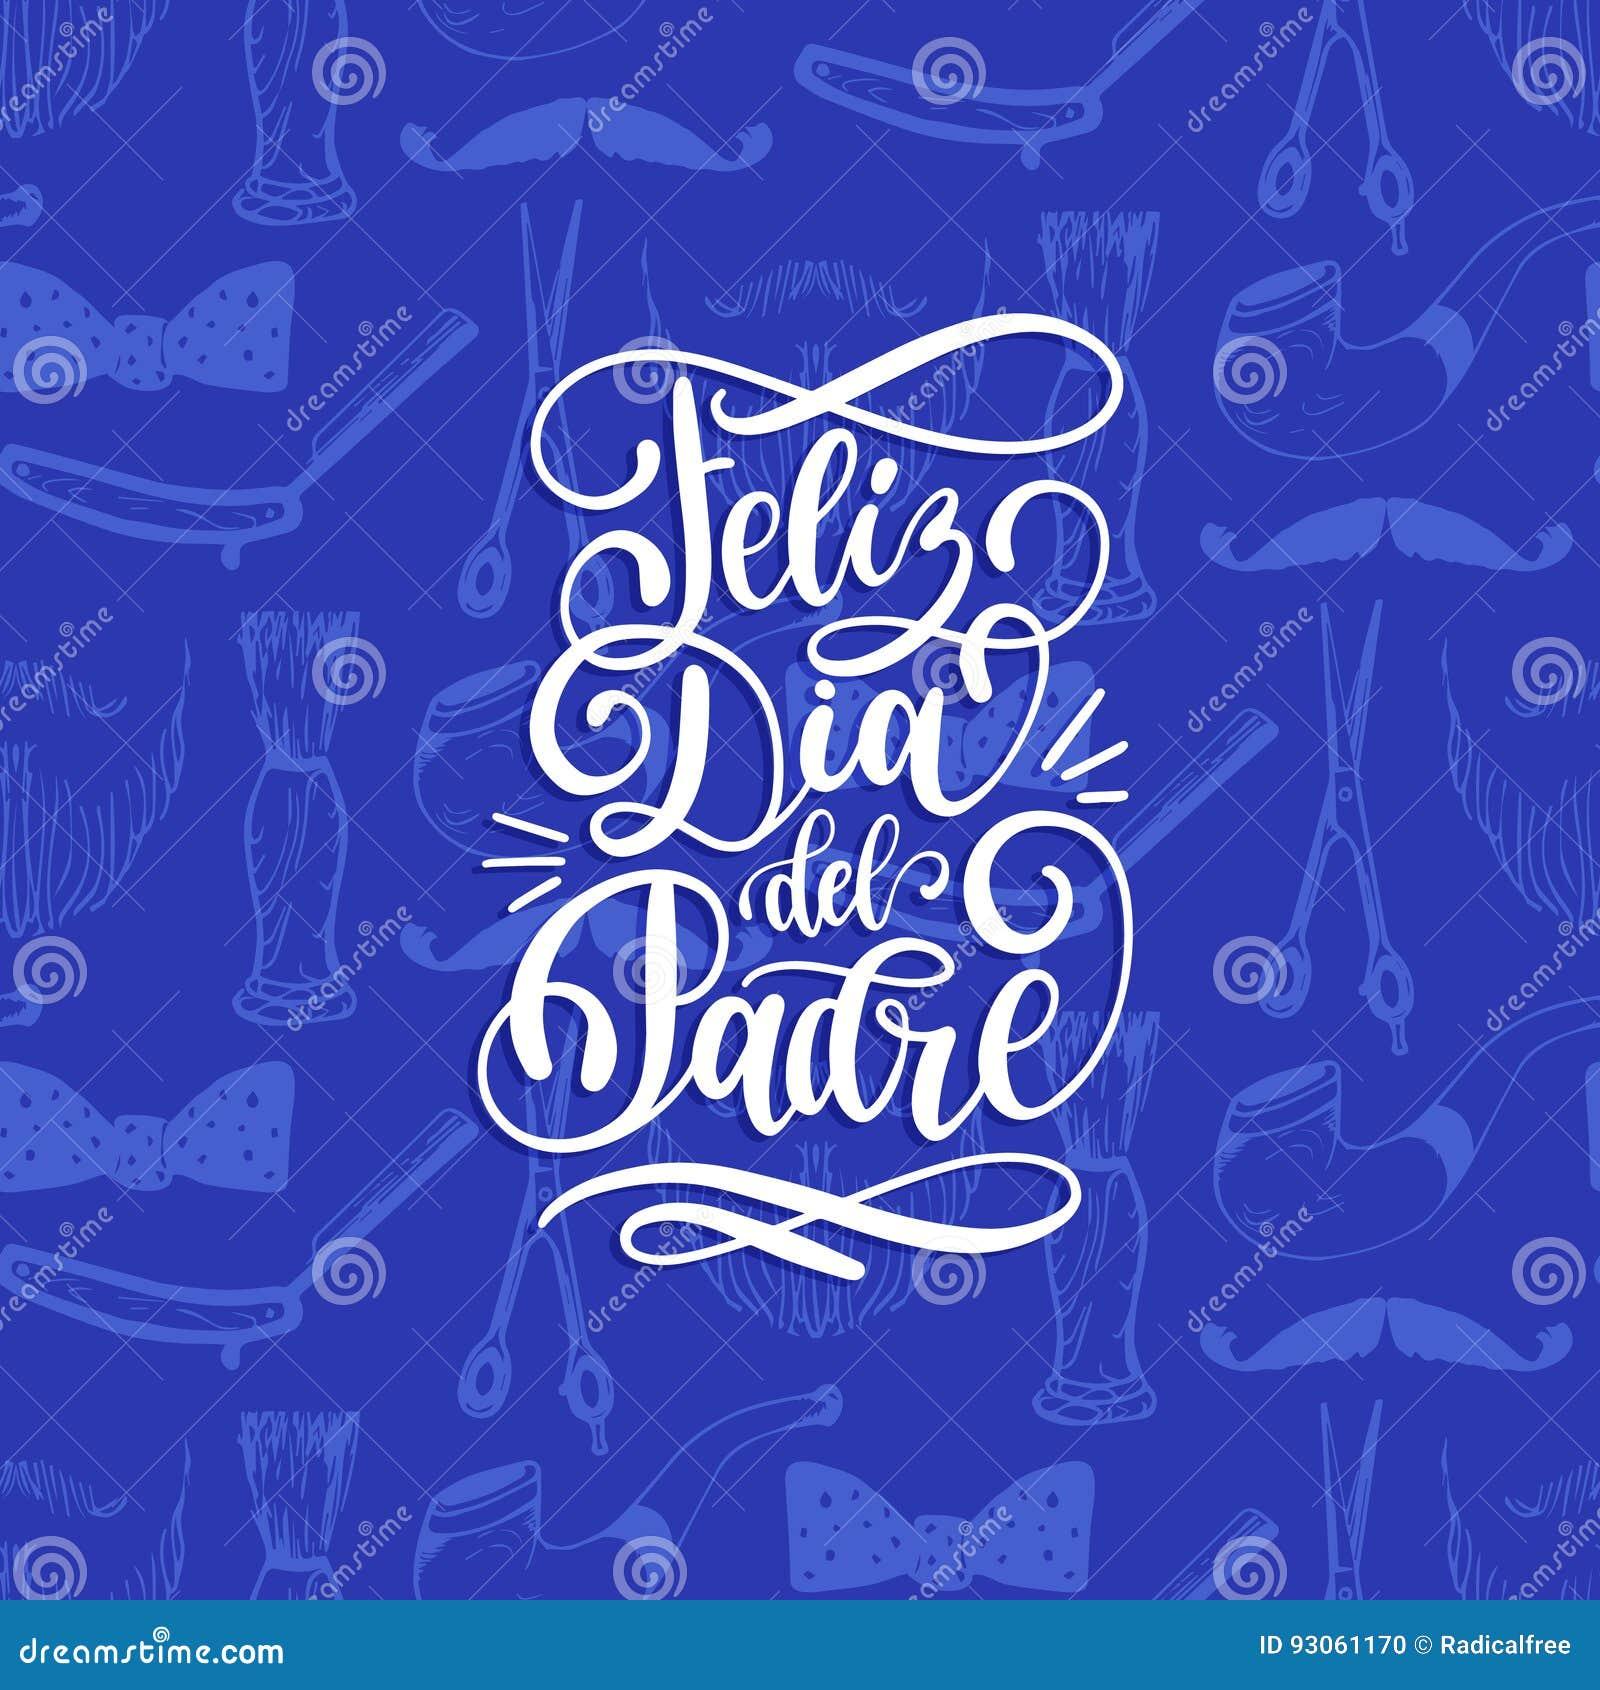 Feliz Dia Del Padre, ισπανική μετάφραση ευτυχούς καλλιγραφικής επιγραφής ημέρας πατέρων για τη ευχετήρια κάρτα, την αφίσα κ.λπ.